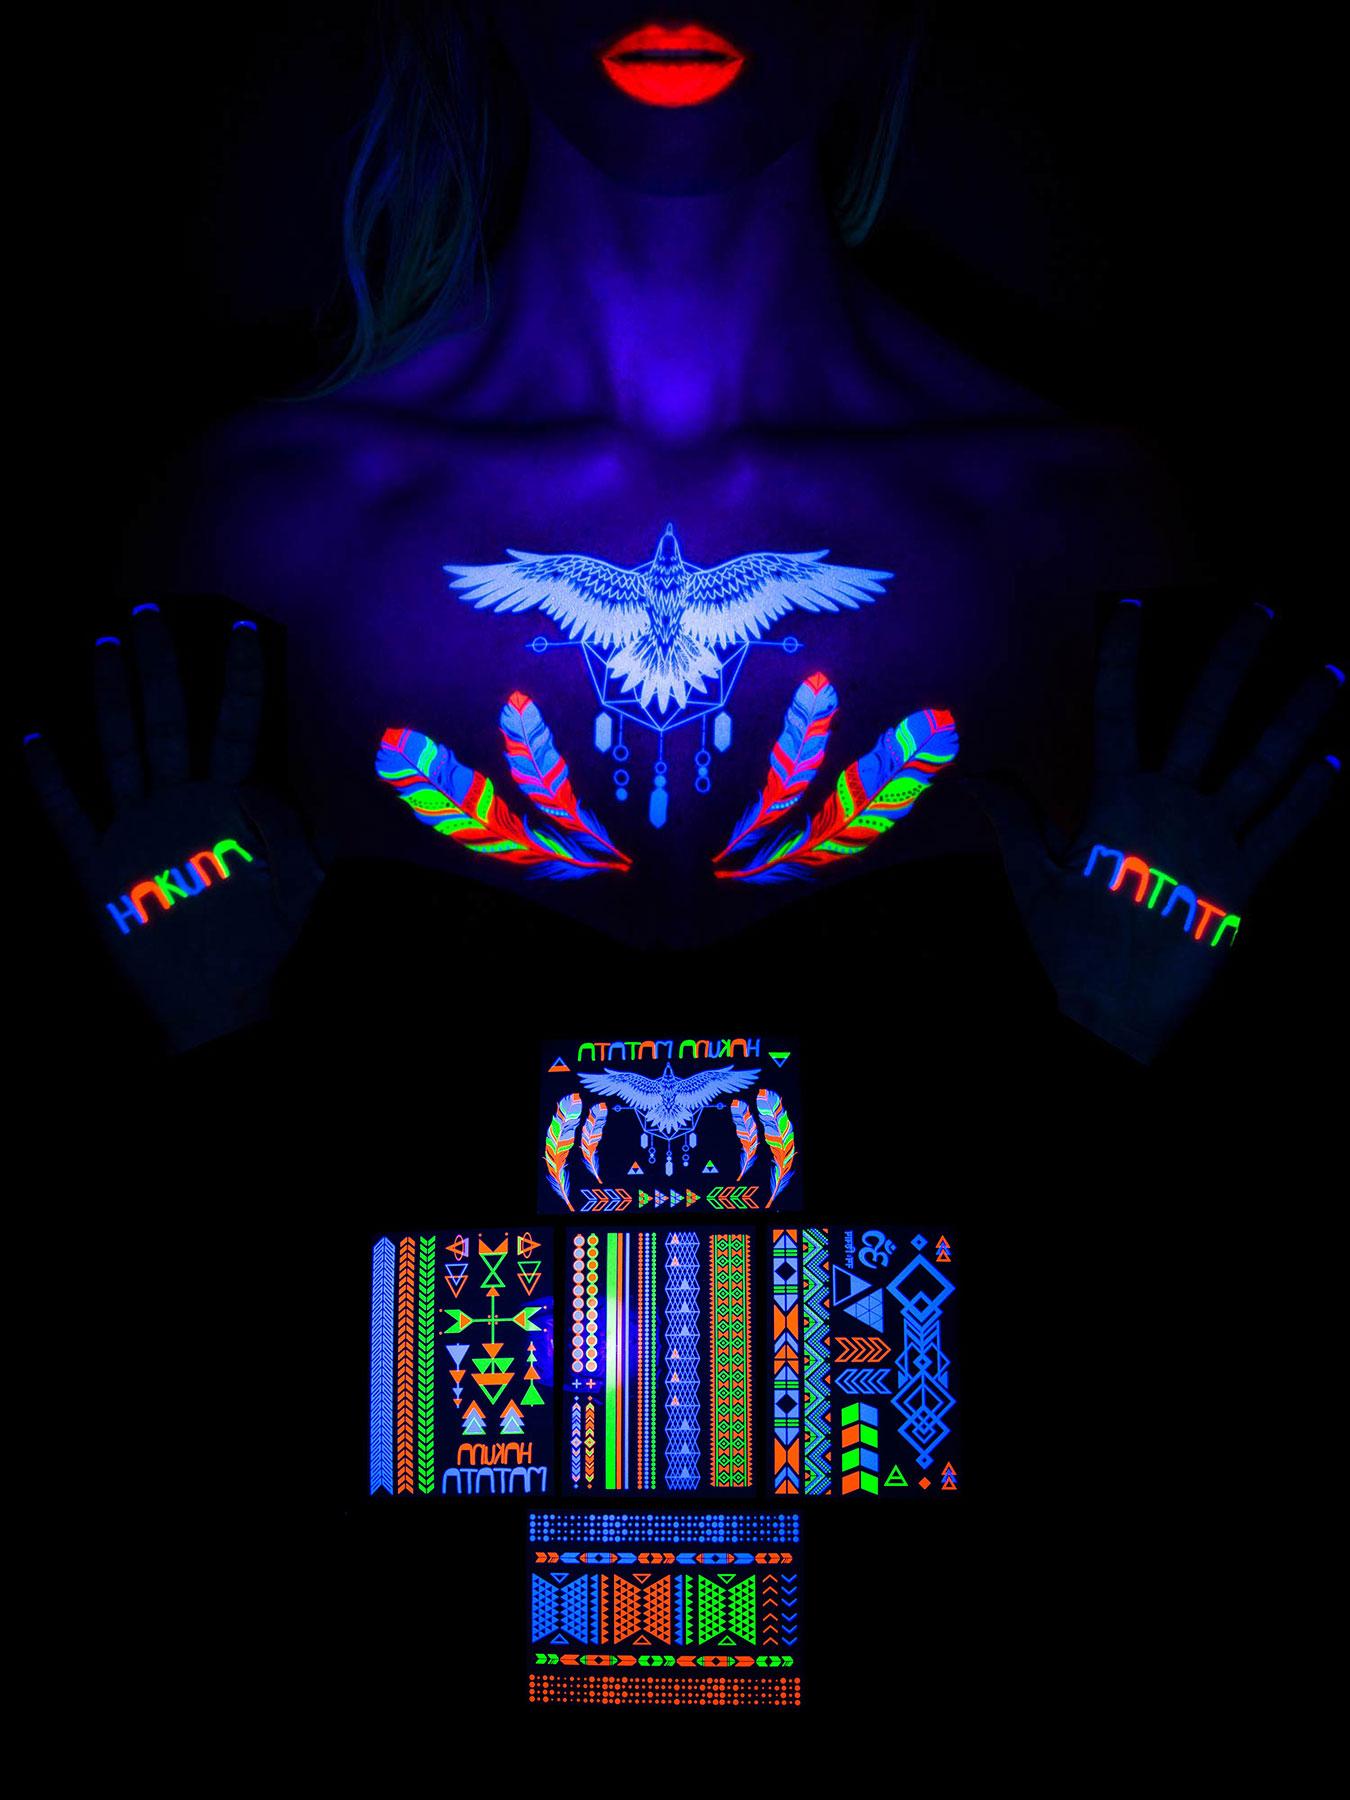 Schwarzlicht Neon Klebe Tattoo Set Nakuna Matata Multicolor Temporar